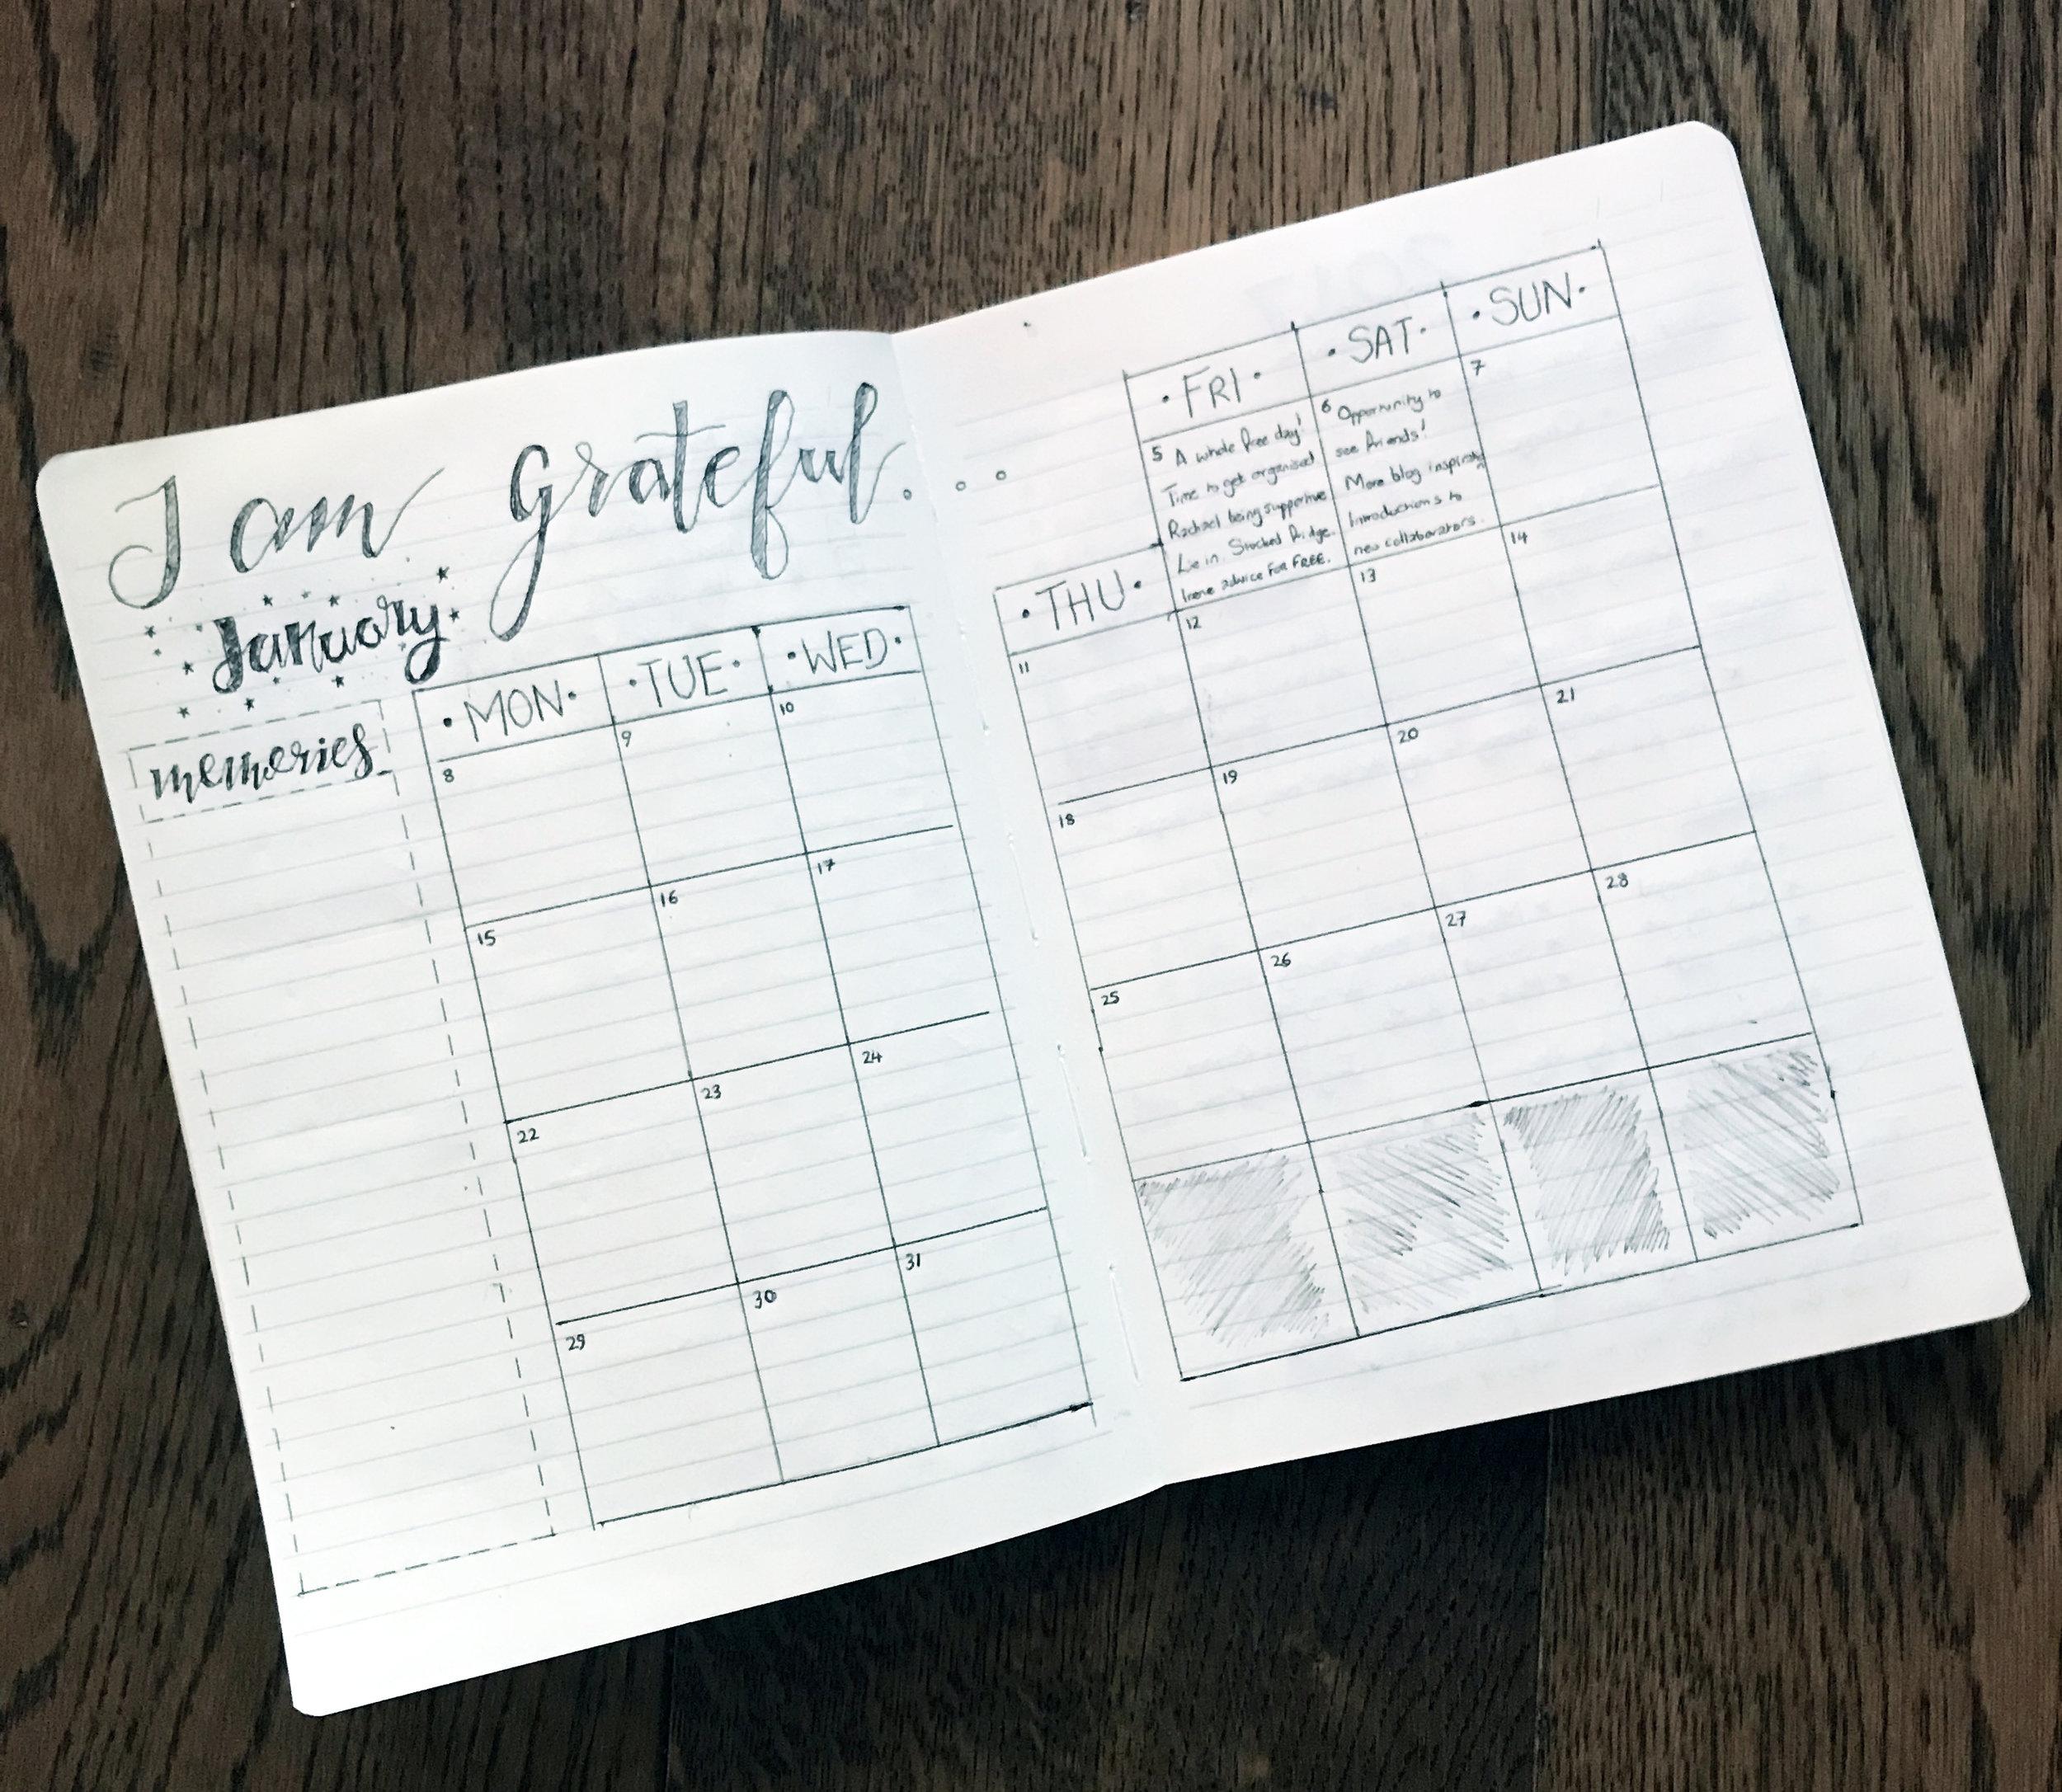 My own hand-drawn gratitude journal